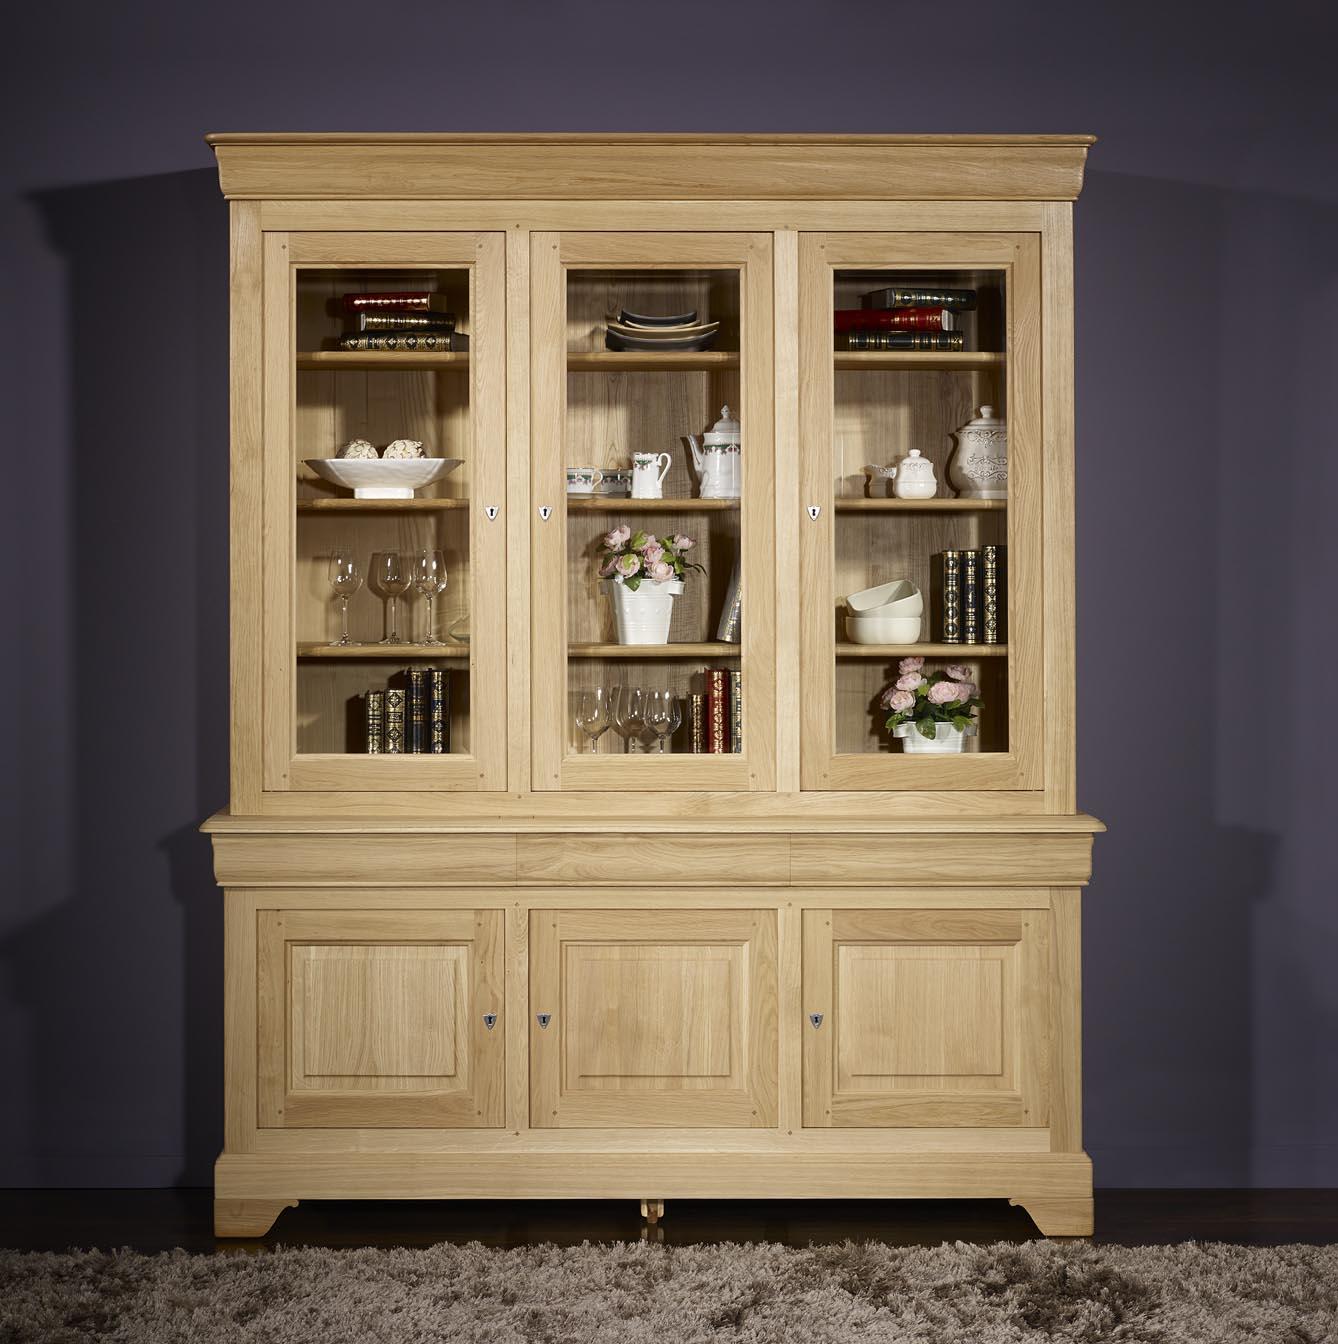 biblioth que 2 corps 3 portes en ch ne massif de style louis philippe finition ch ne bross. Black Bedroom Furniture Sets. Home Design Ideas